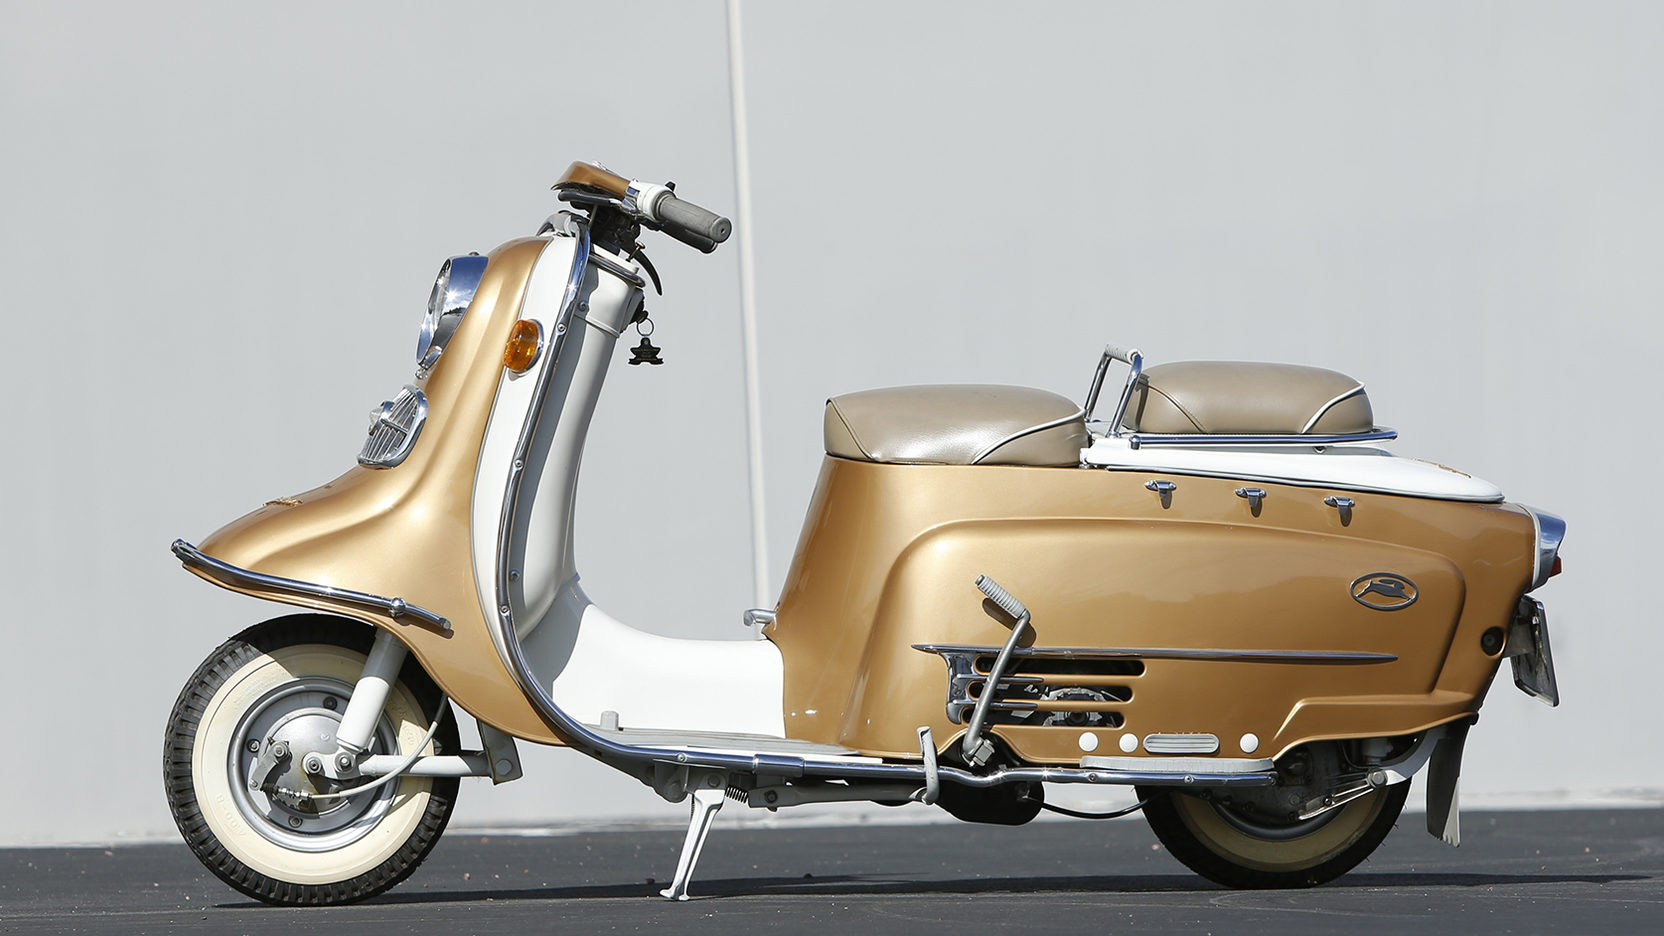 1959 fuji rabbit scooter side profile